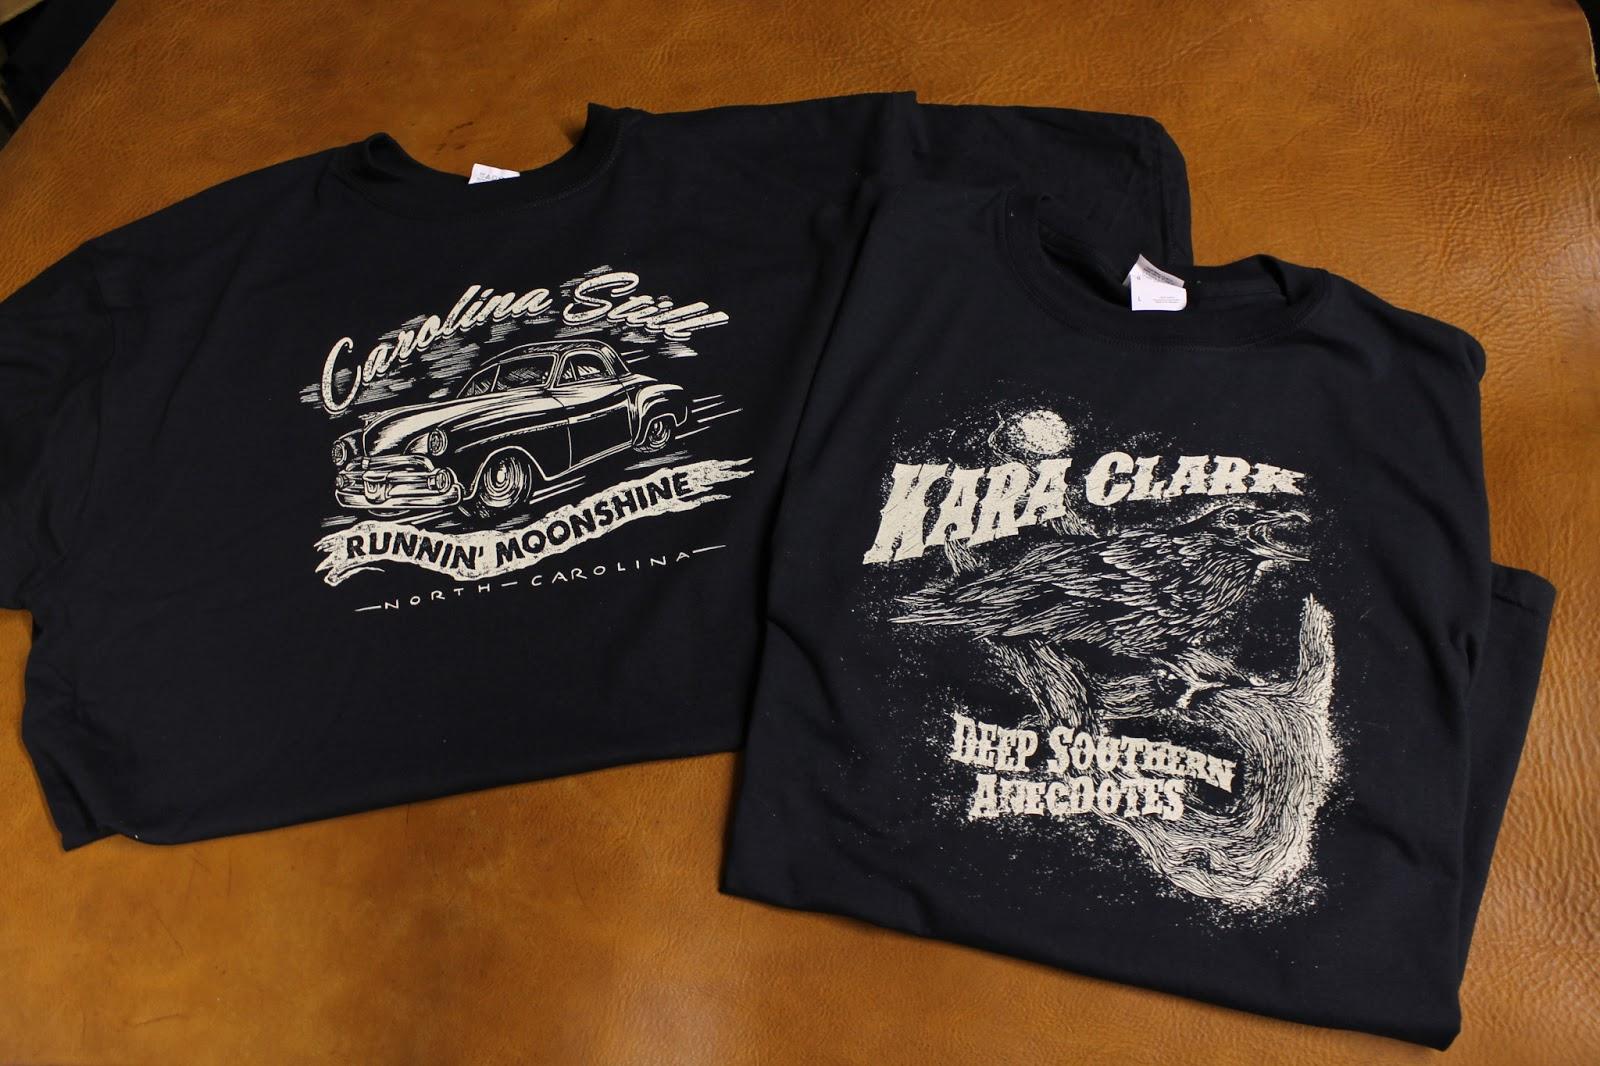 nd New Carolina Still and Kara Clark Shirt Designs - Rusty ... Homemade Chopper T Shirt Design on coast guard harley shirts, live in cali shirts, chopper posters, motorcycle shirts, west coast choppers shirts,